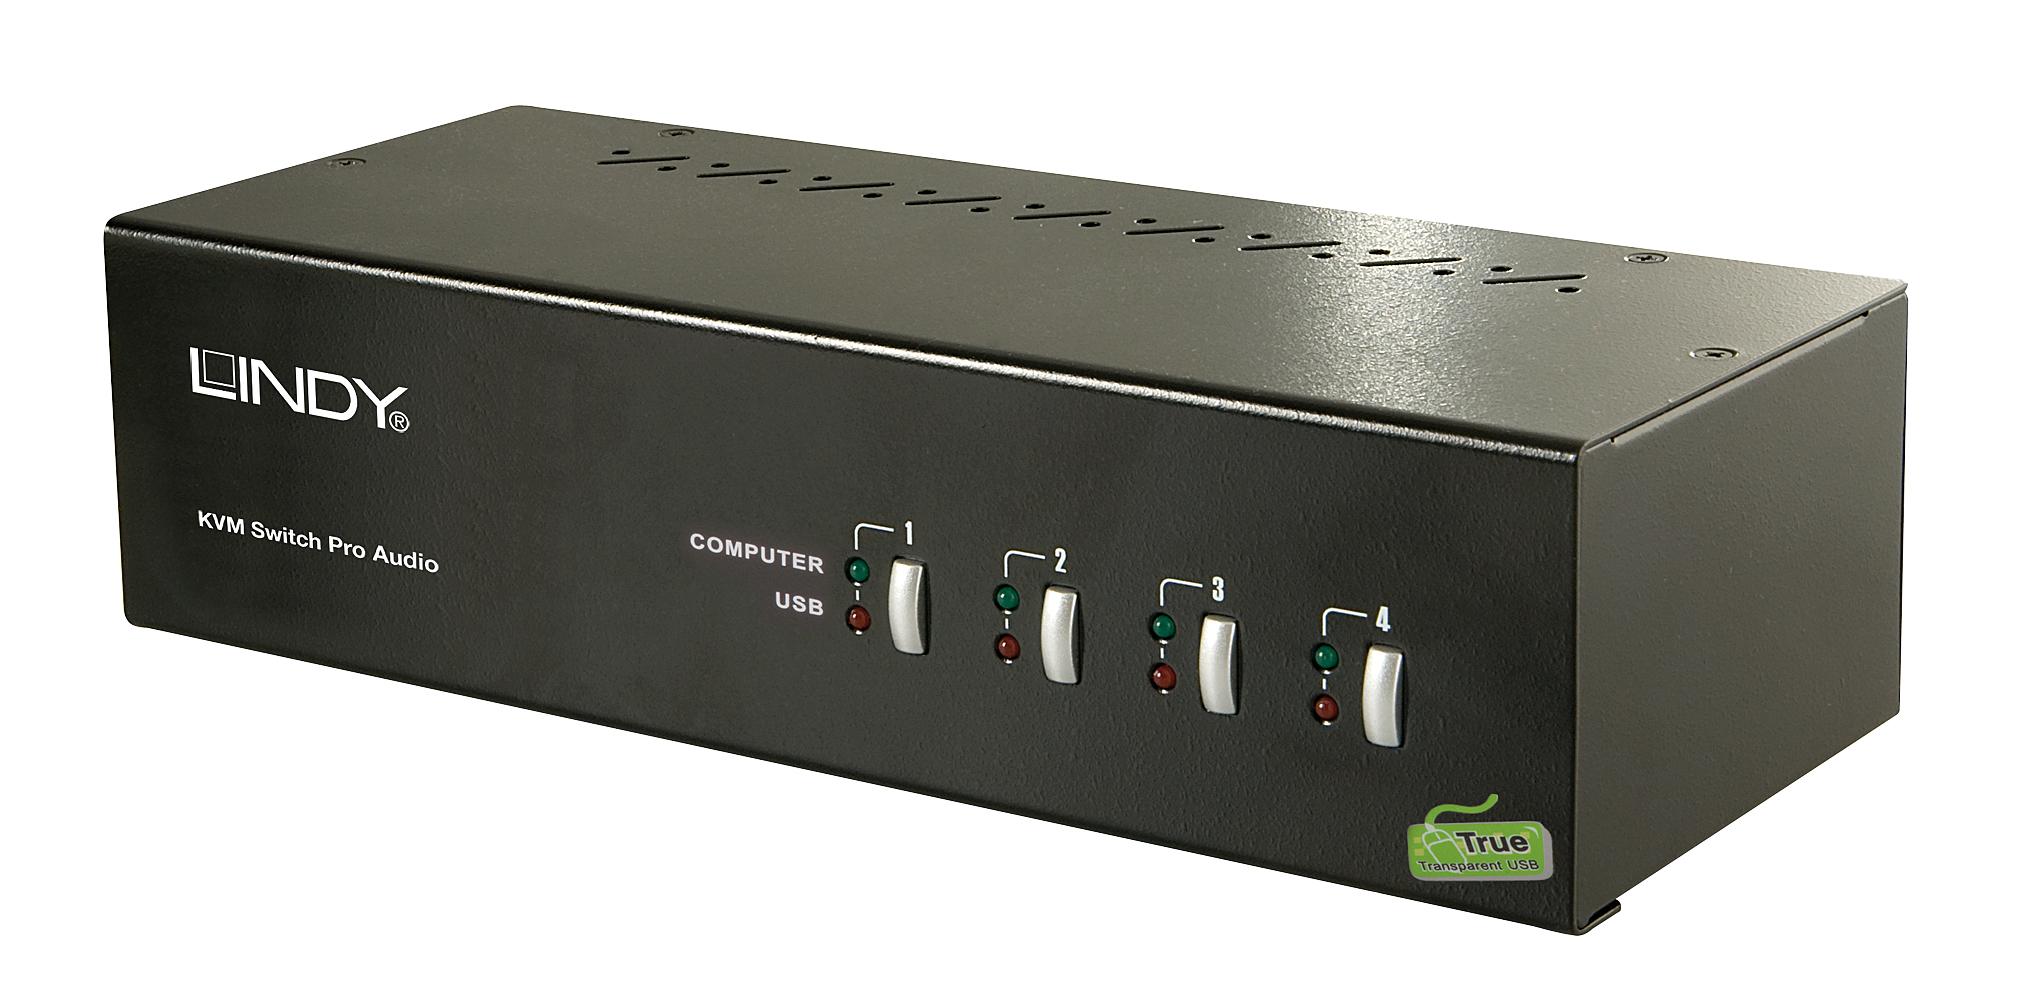 Lindy KVM Switch Pro Audio - KVM-/Audio-/USB-Switch - USB